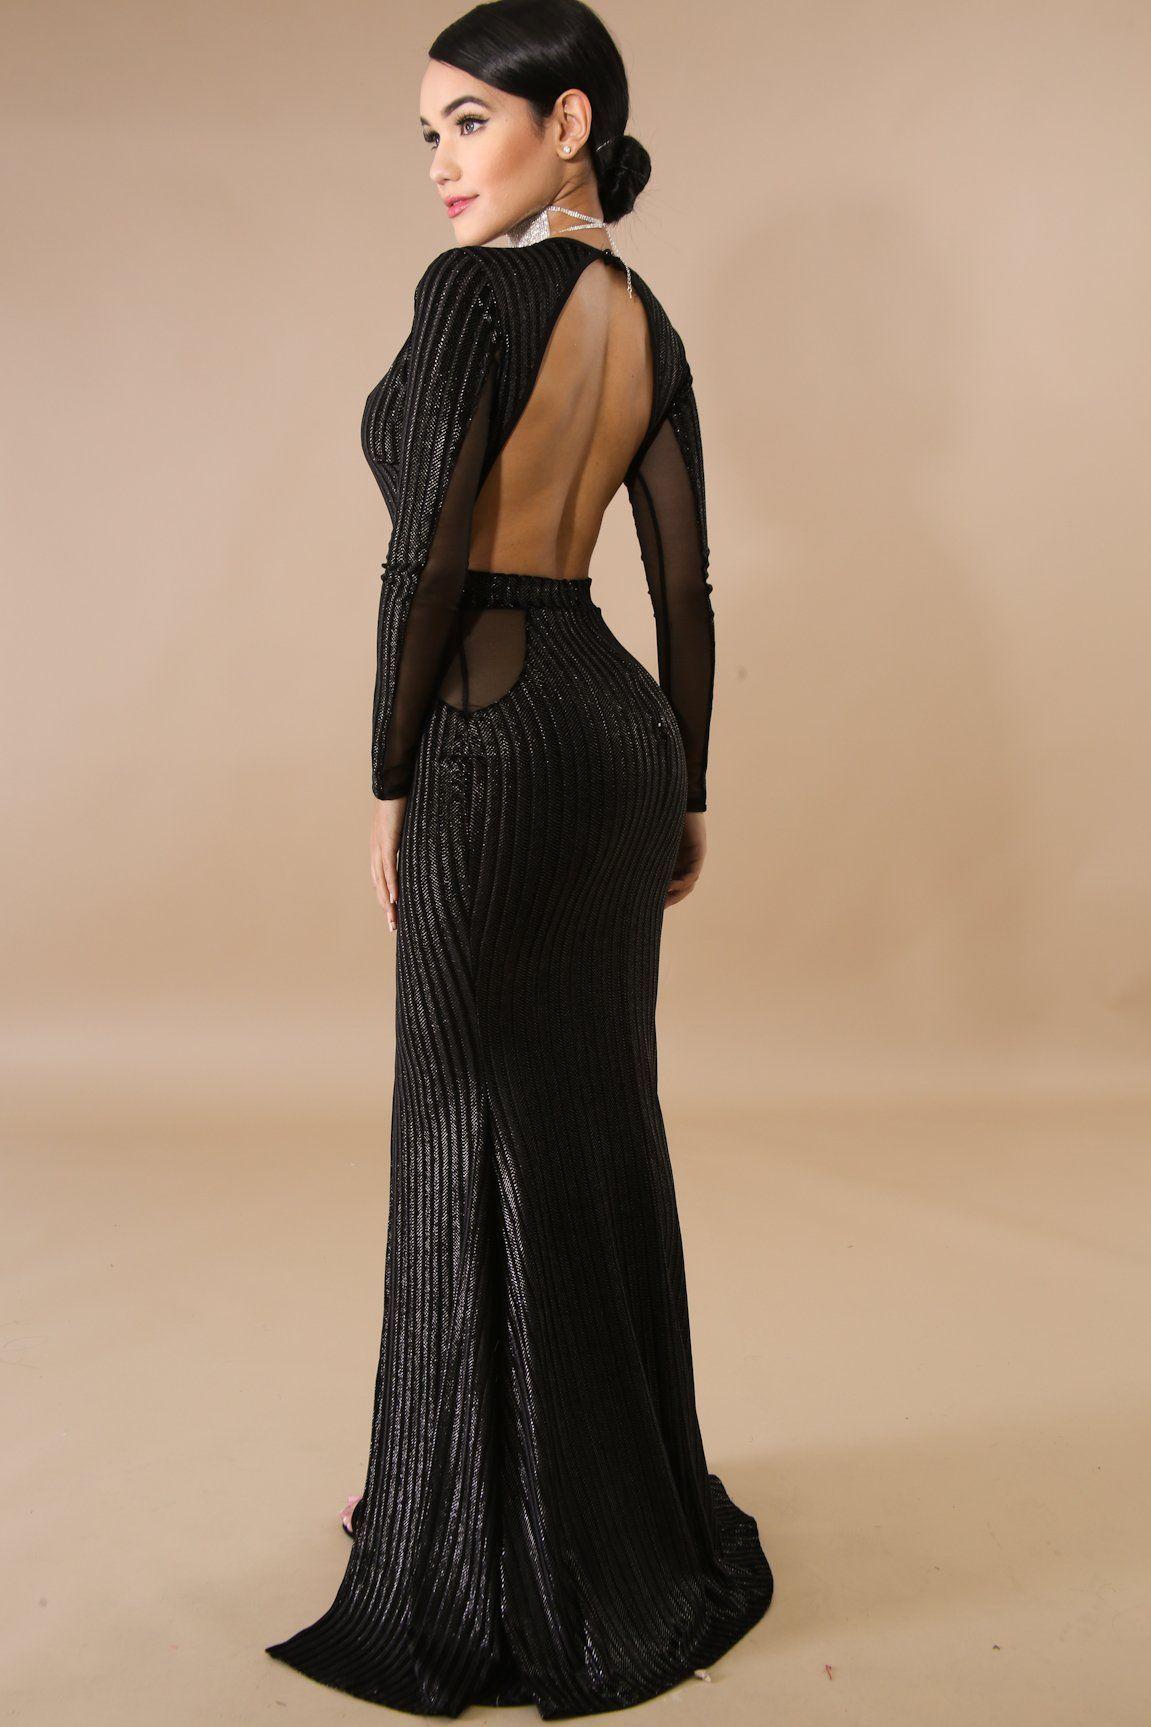 Chevron suede shine maxi dress in dresses pinterest